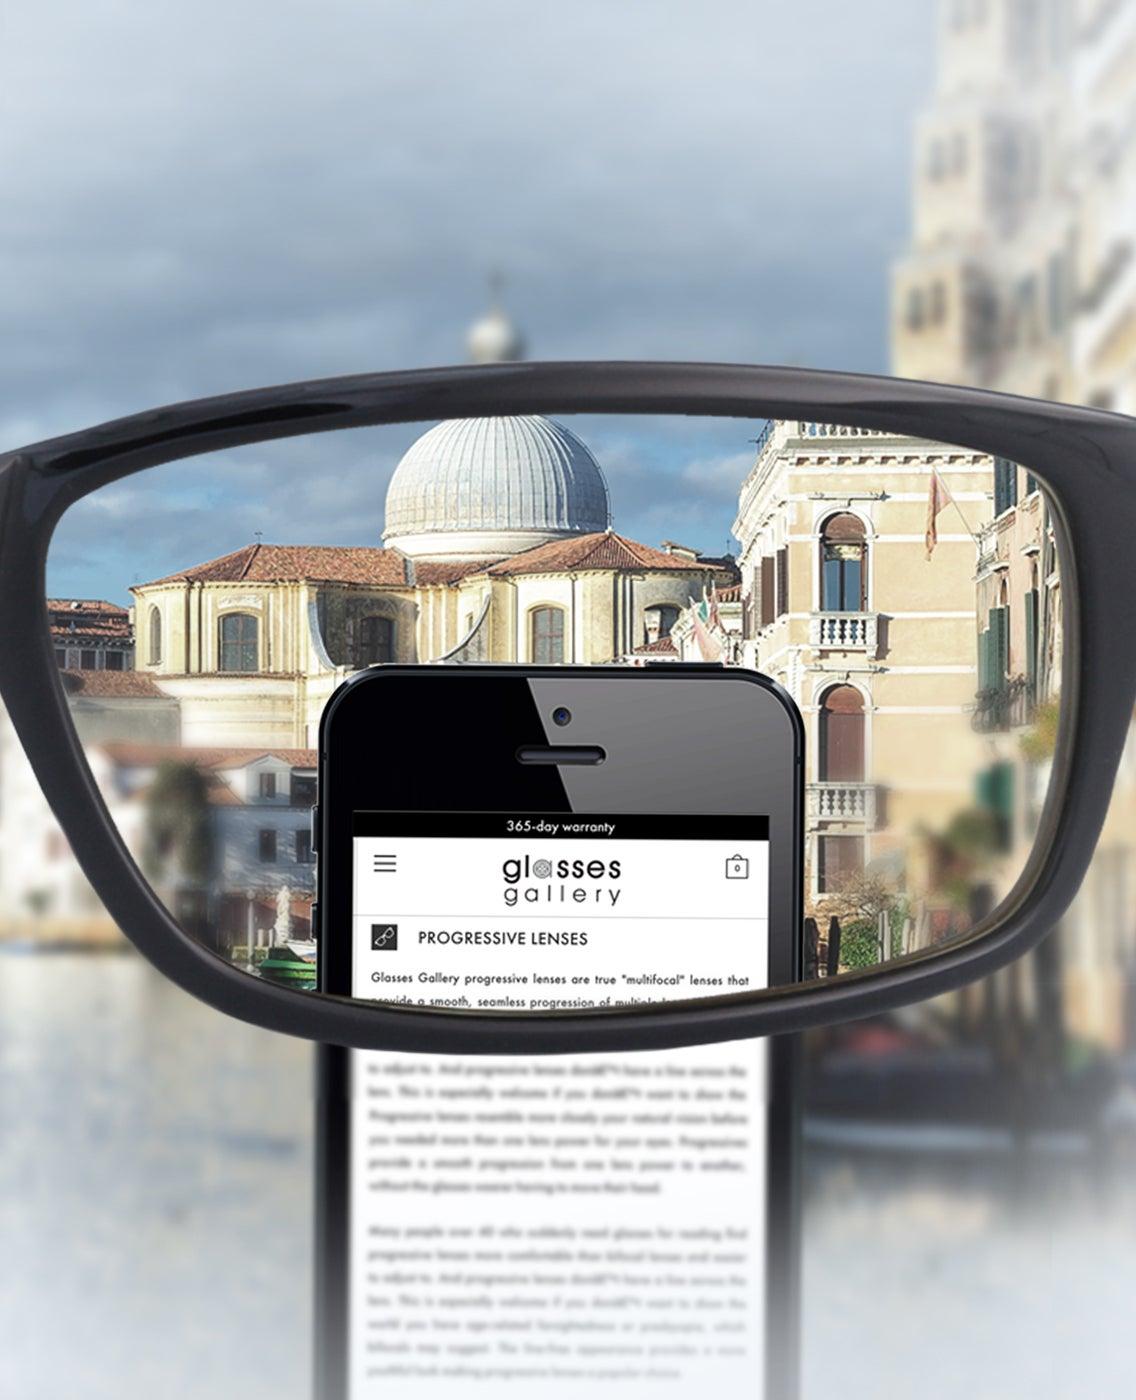 Glassesgallery our lens - Progressive